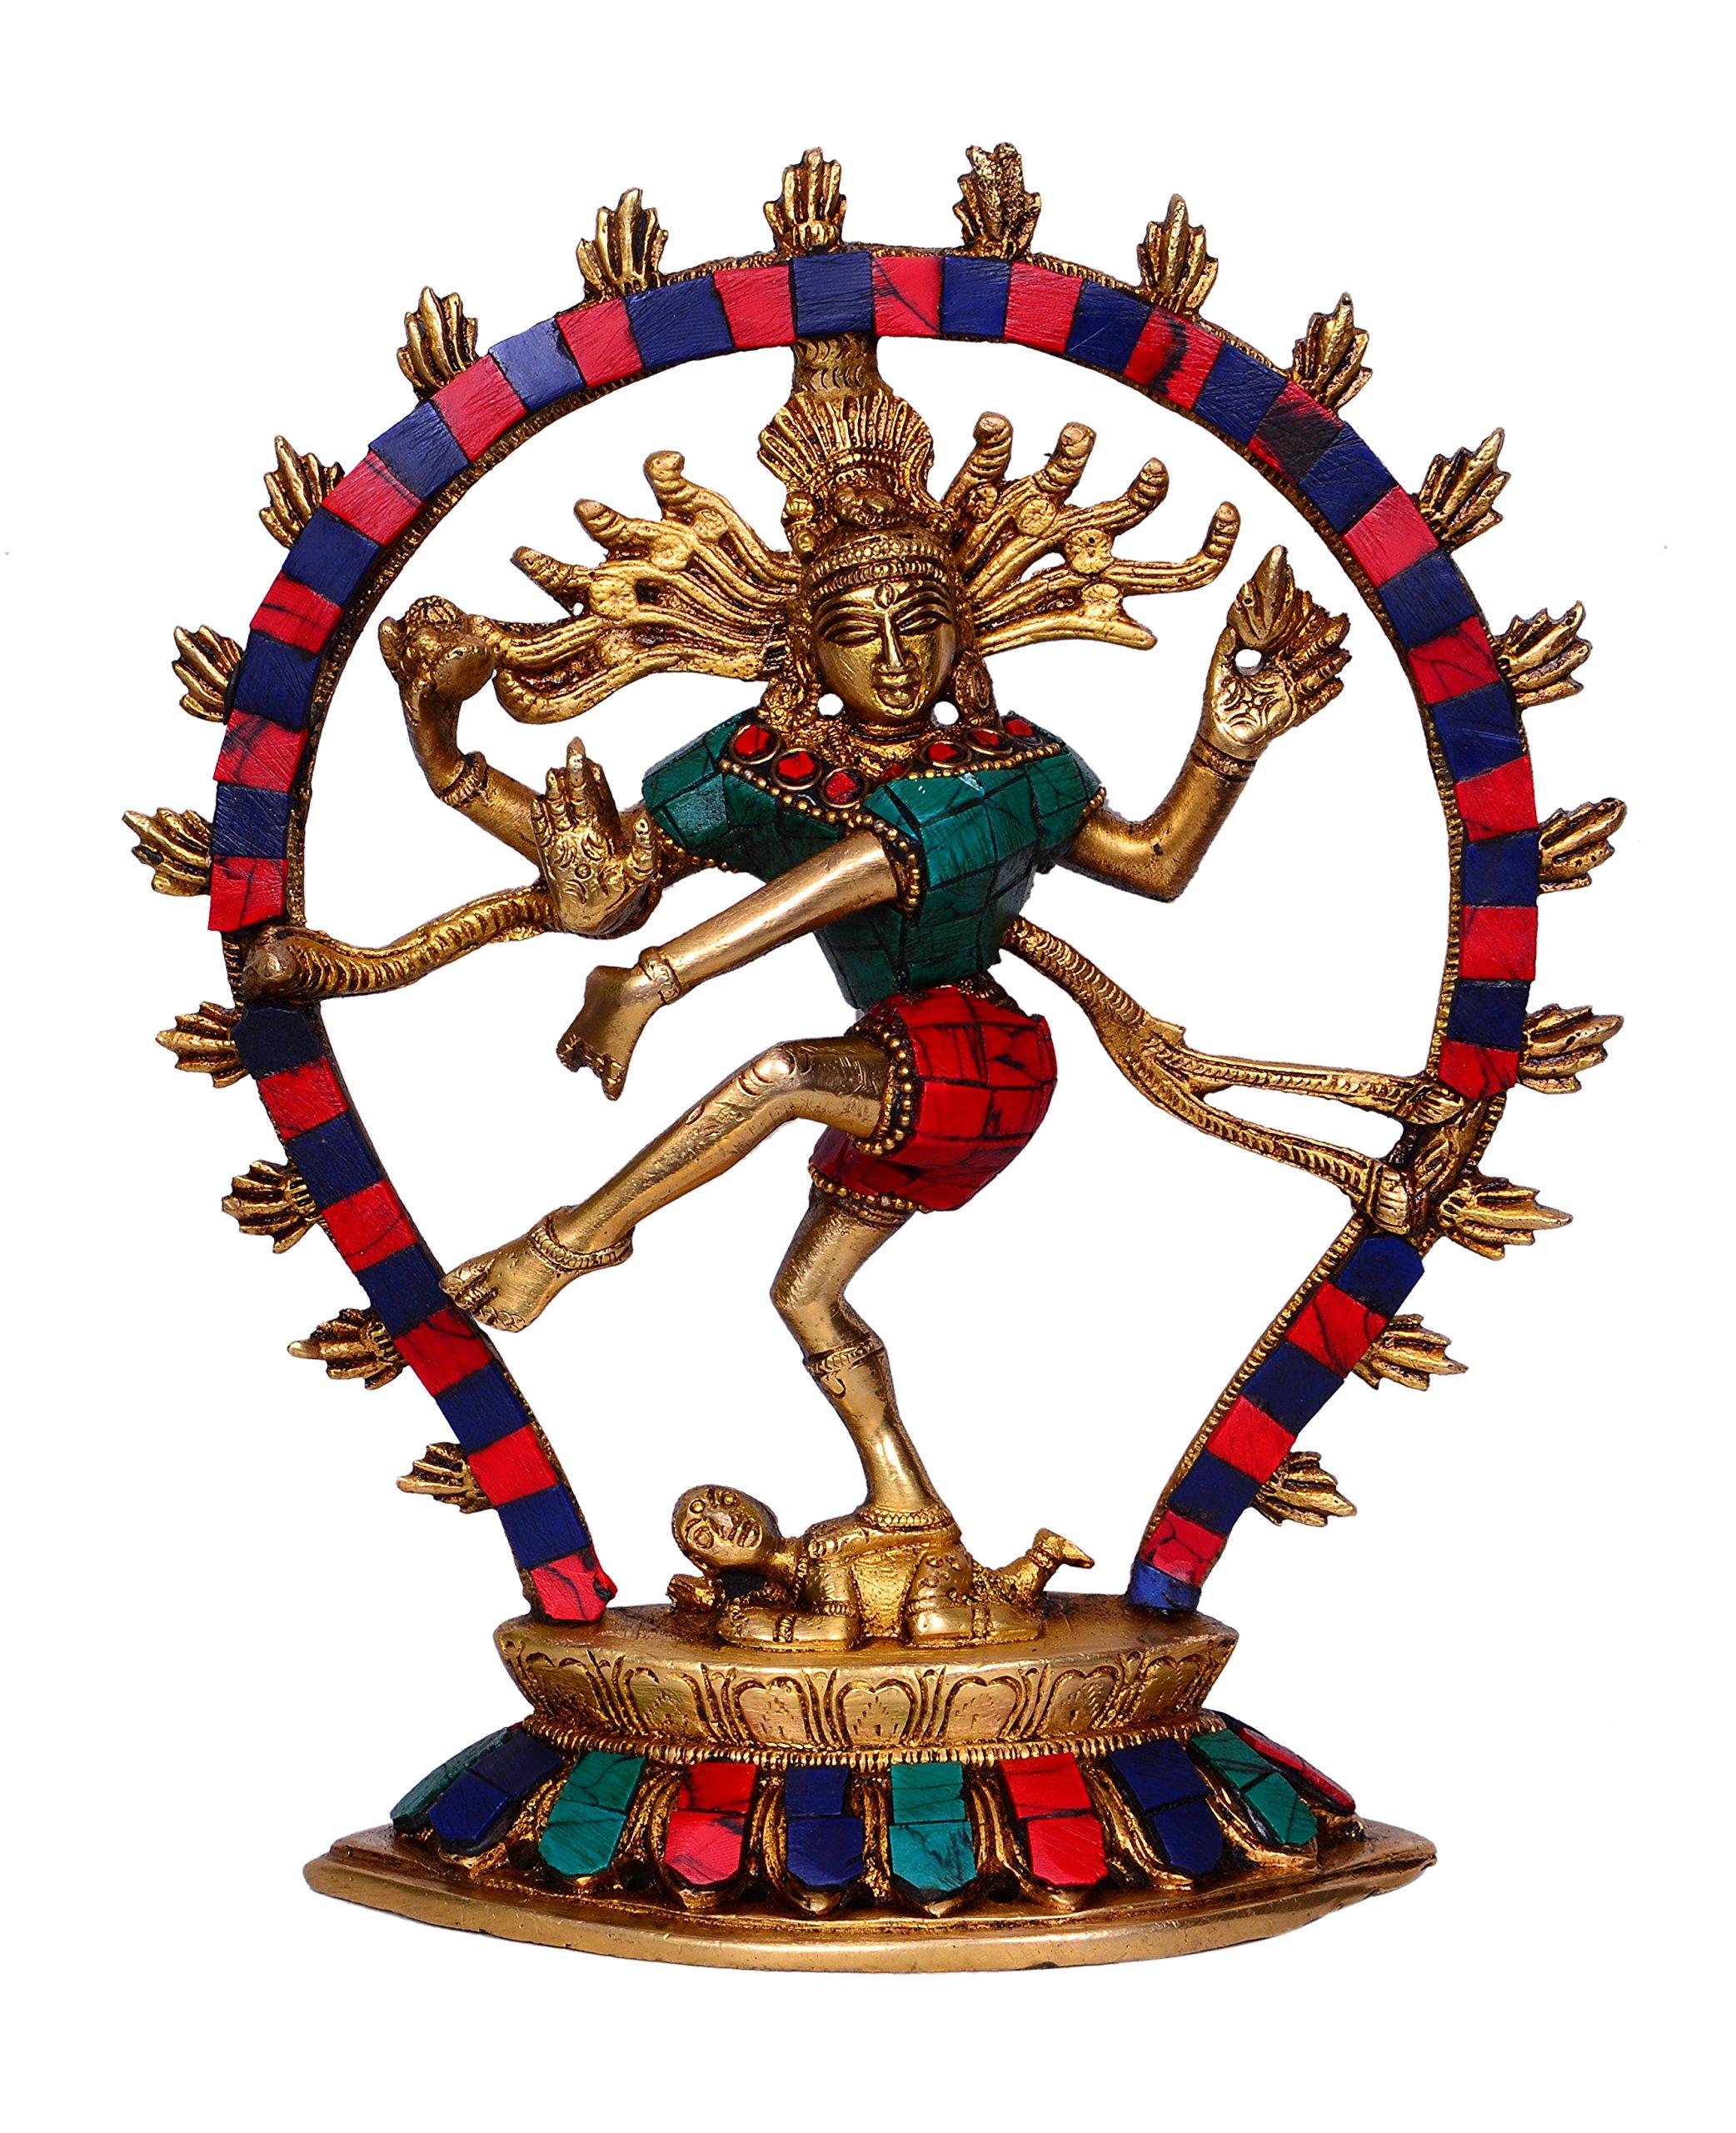 Nataraja Statue Idol: Lord Shiva Siva Mahadev In Dance Mudra For Home Temple Mandir, Made of Pure Brass 8.5 inch (10446)